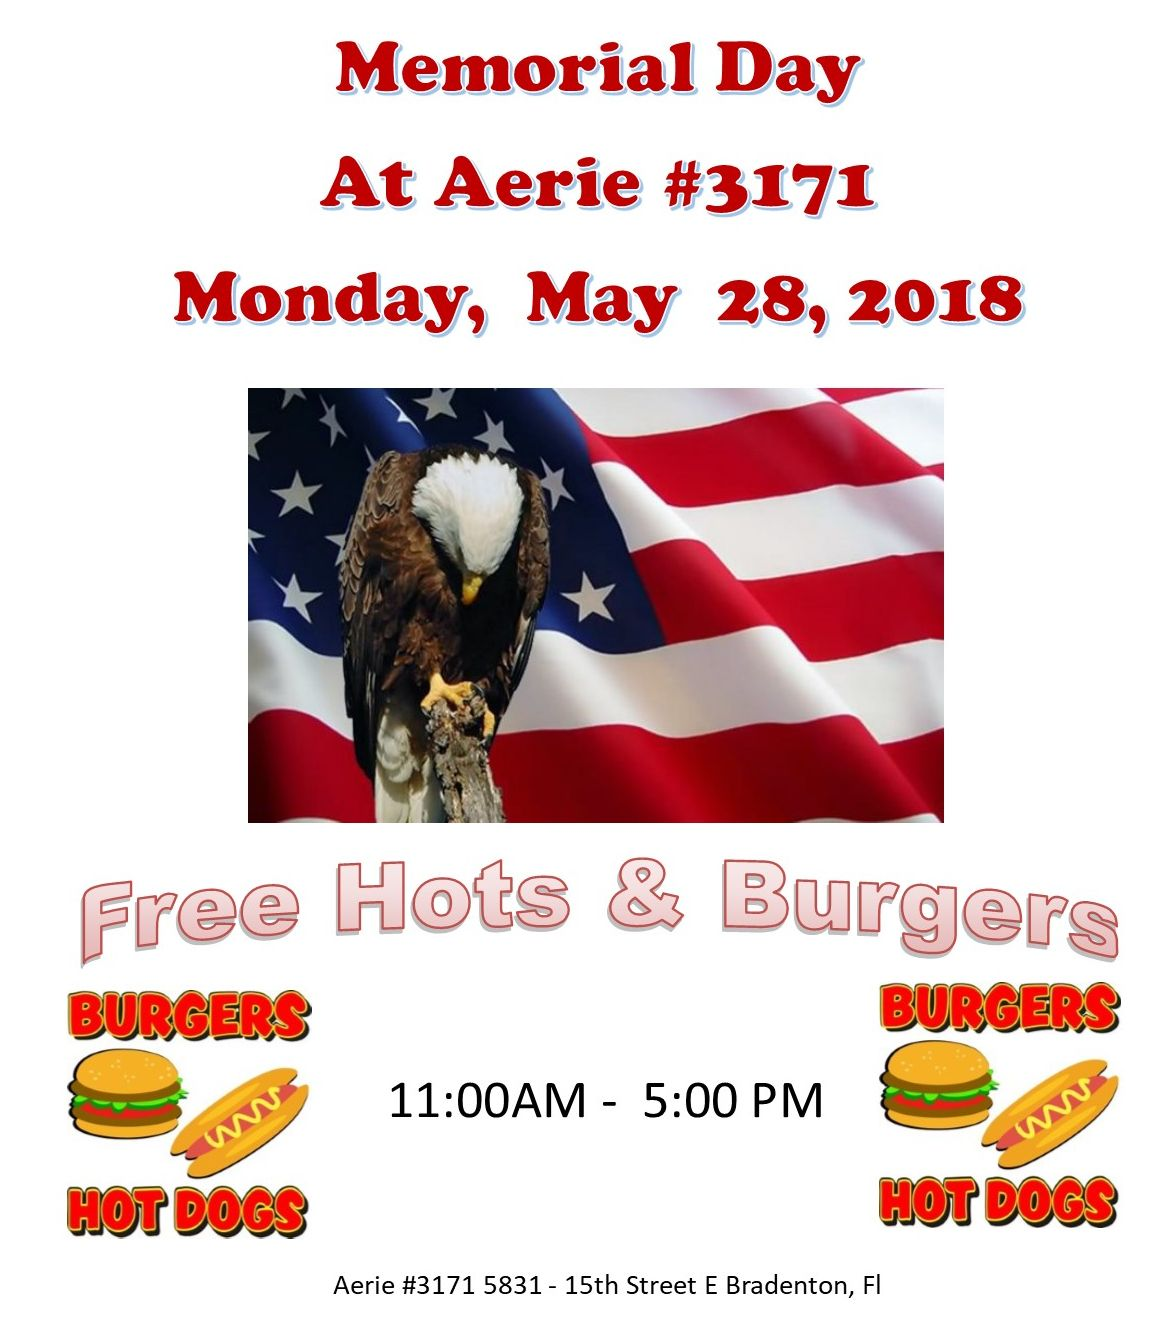 Memorial Day Hots & Burgers